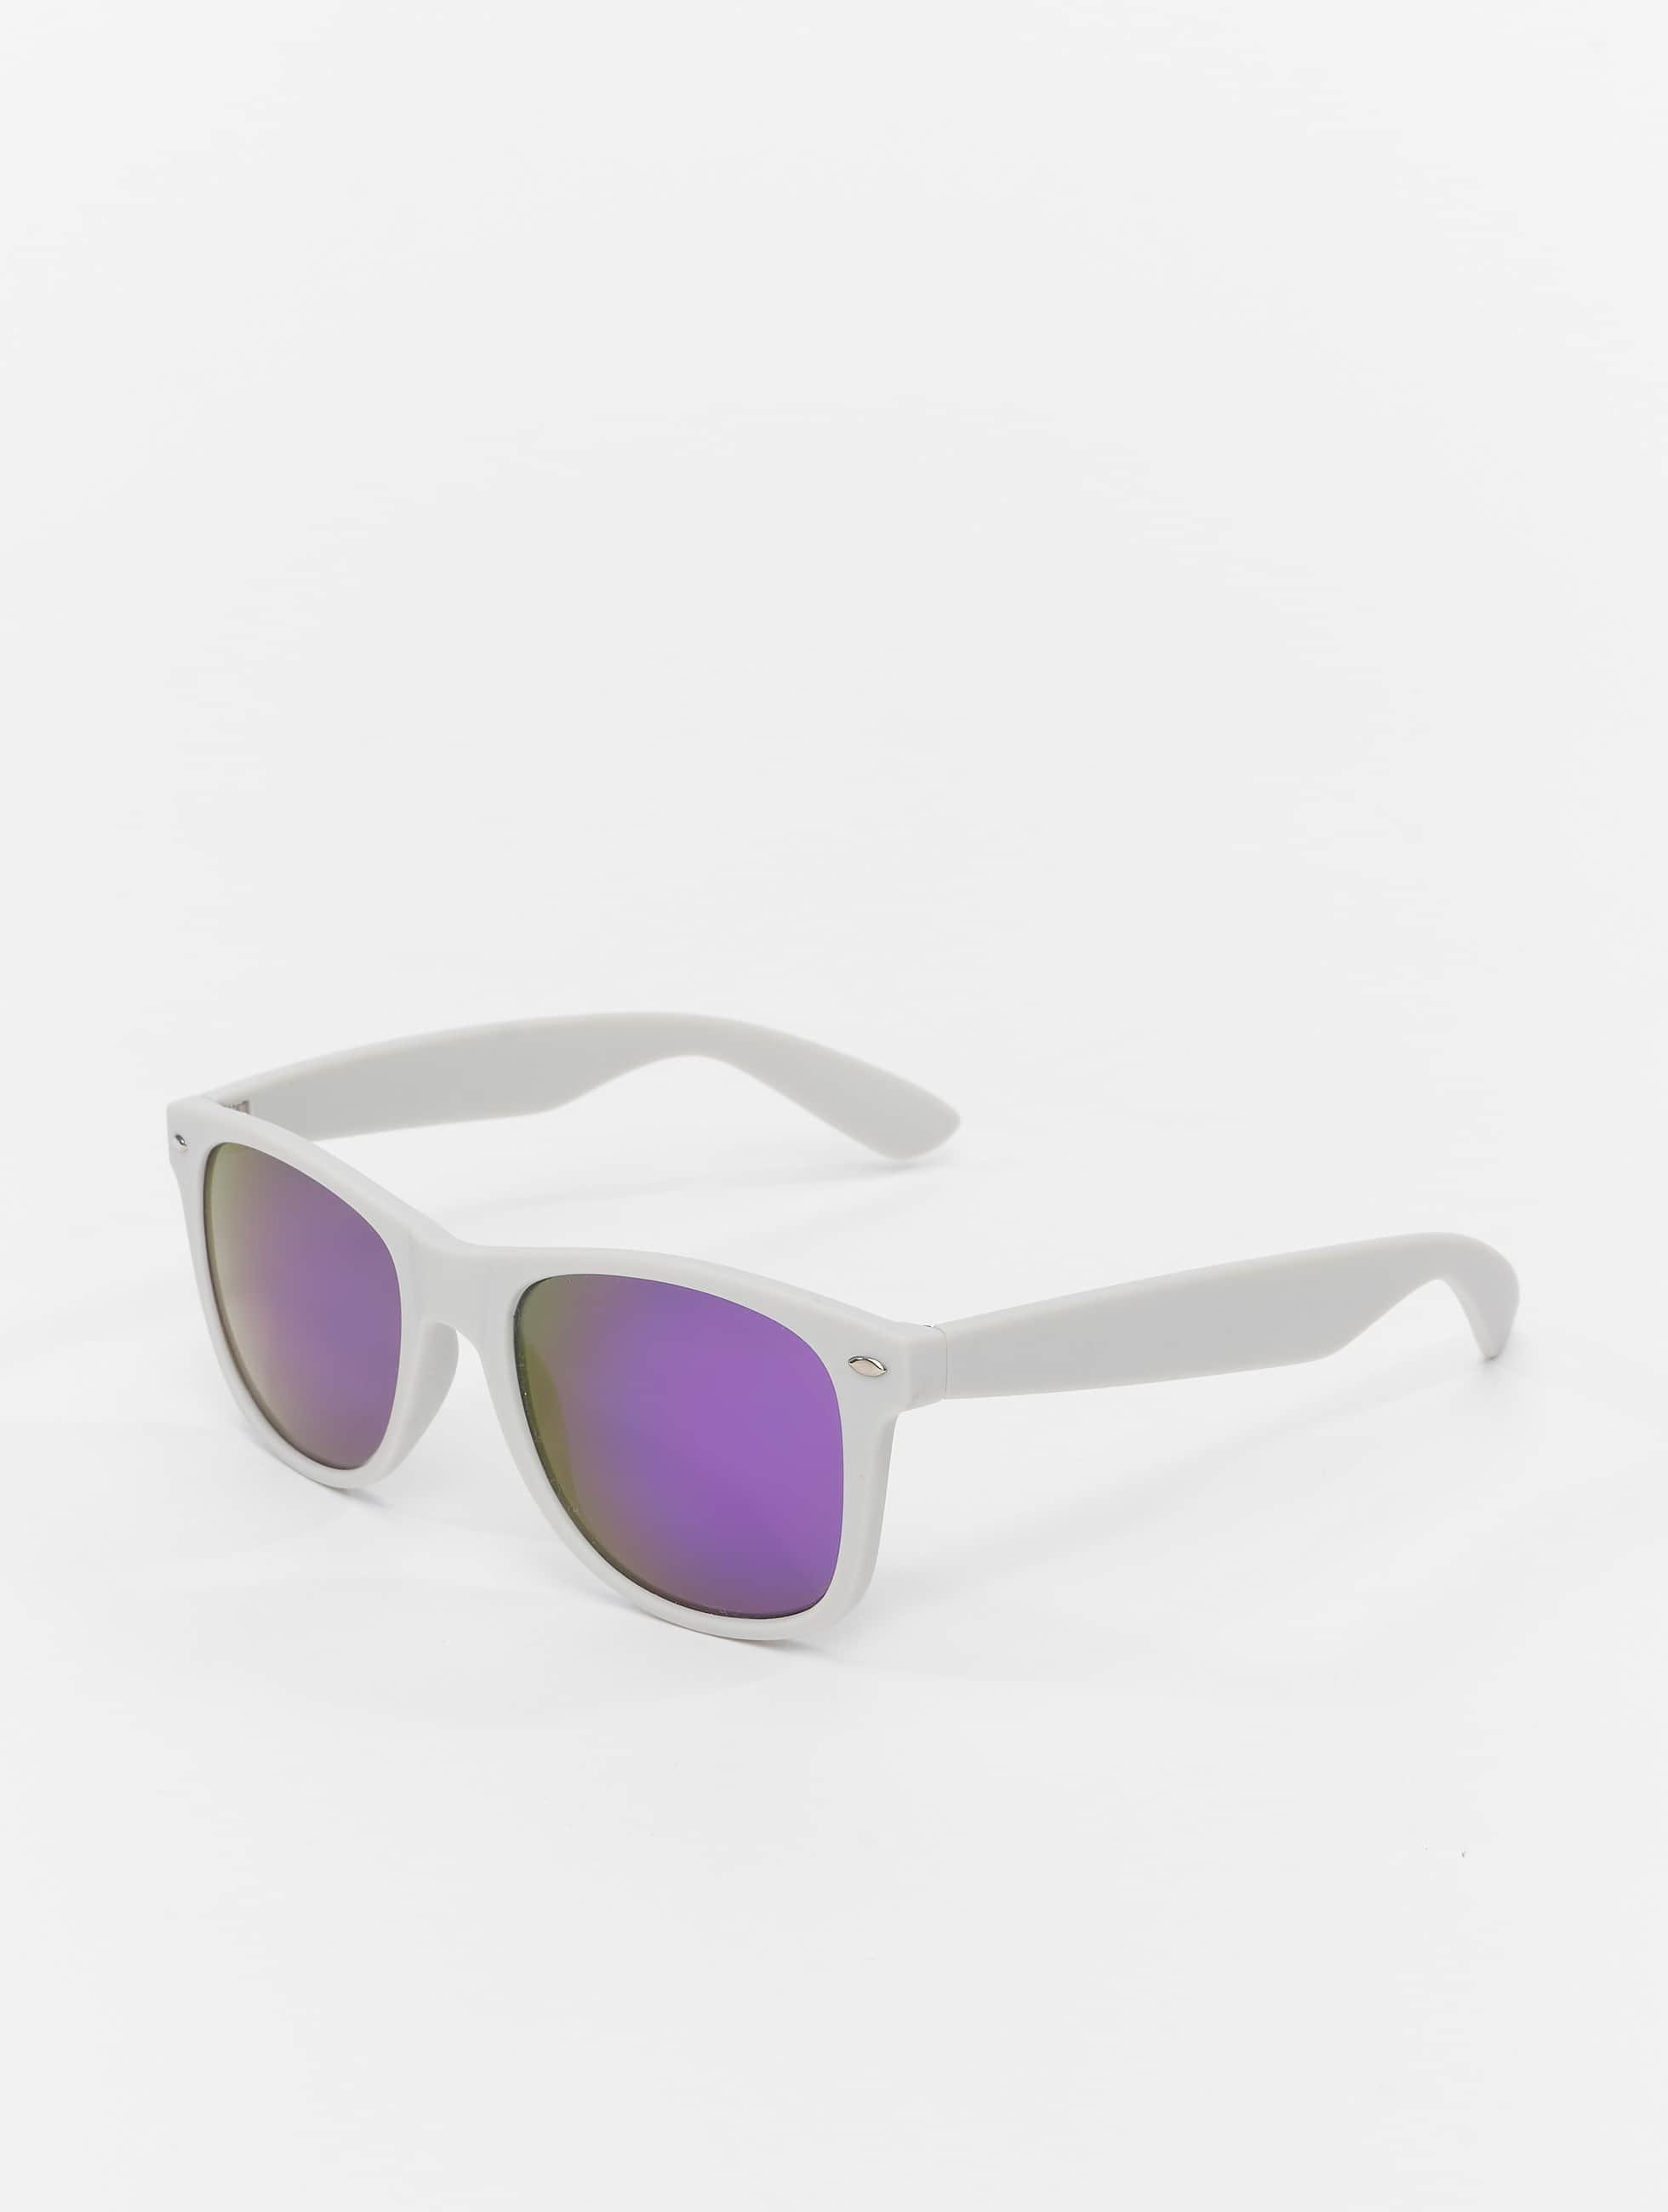 MSTRDS Aurinkolasit Likoma Mirror harmaa